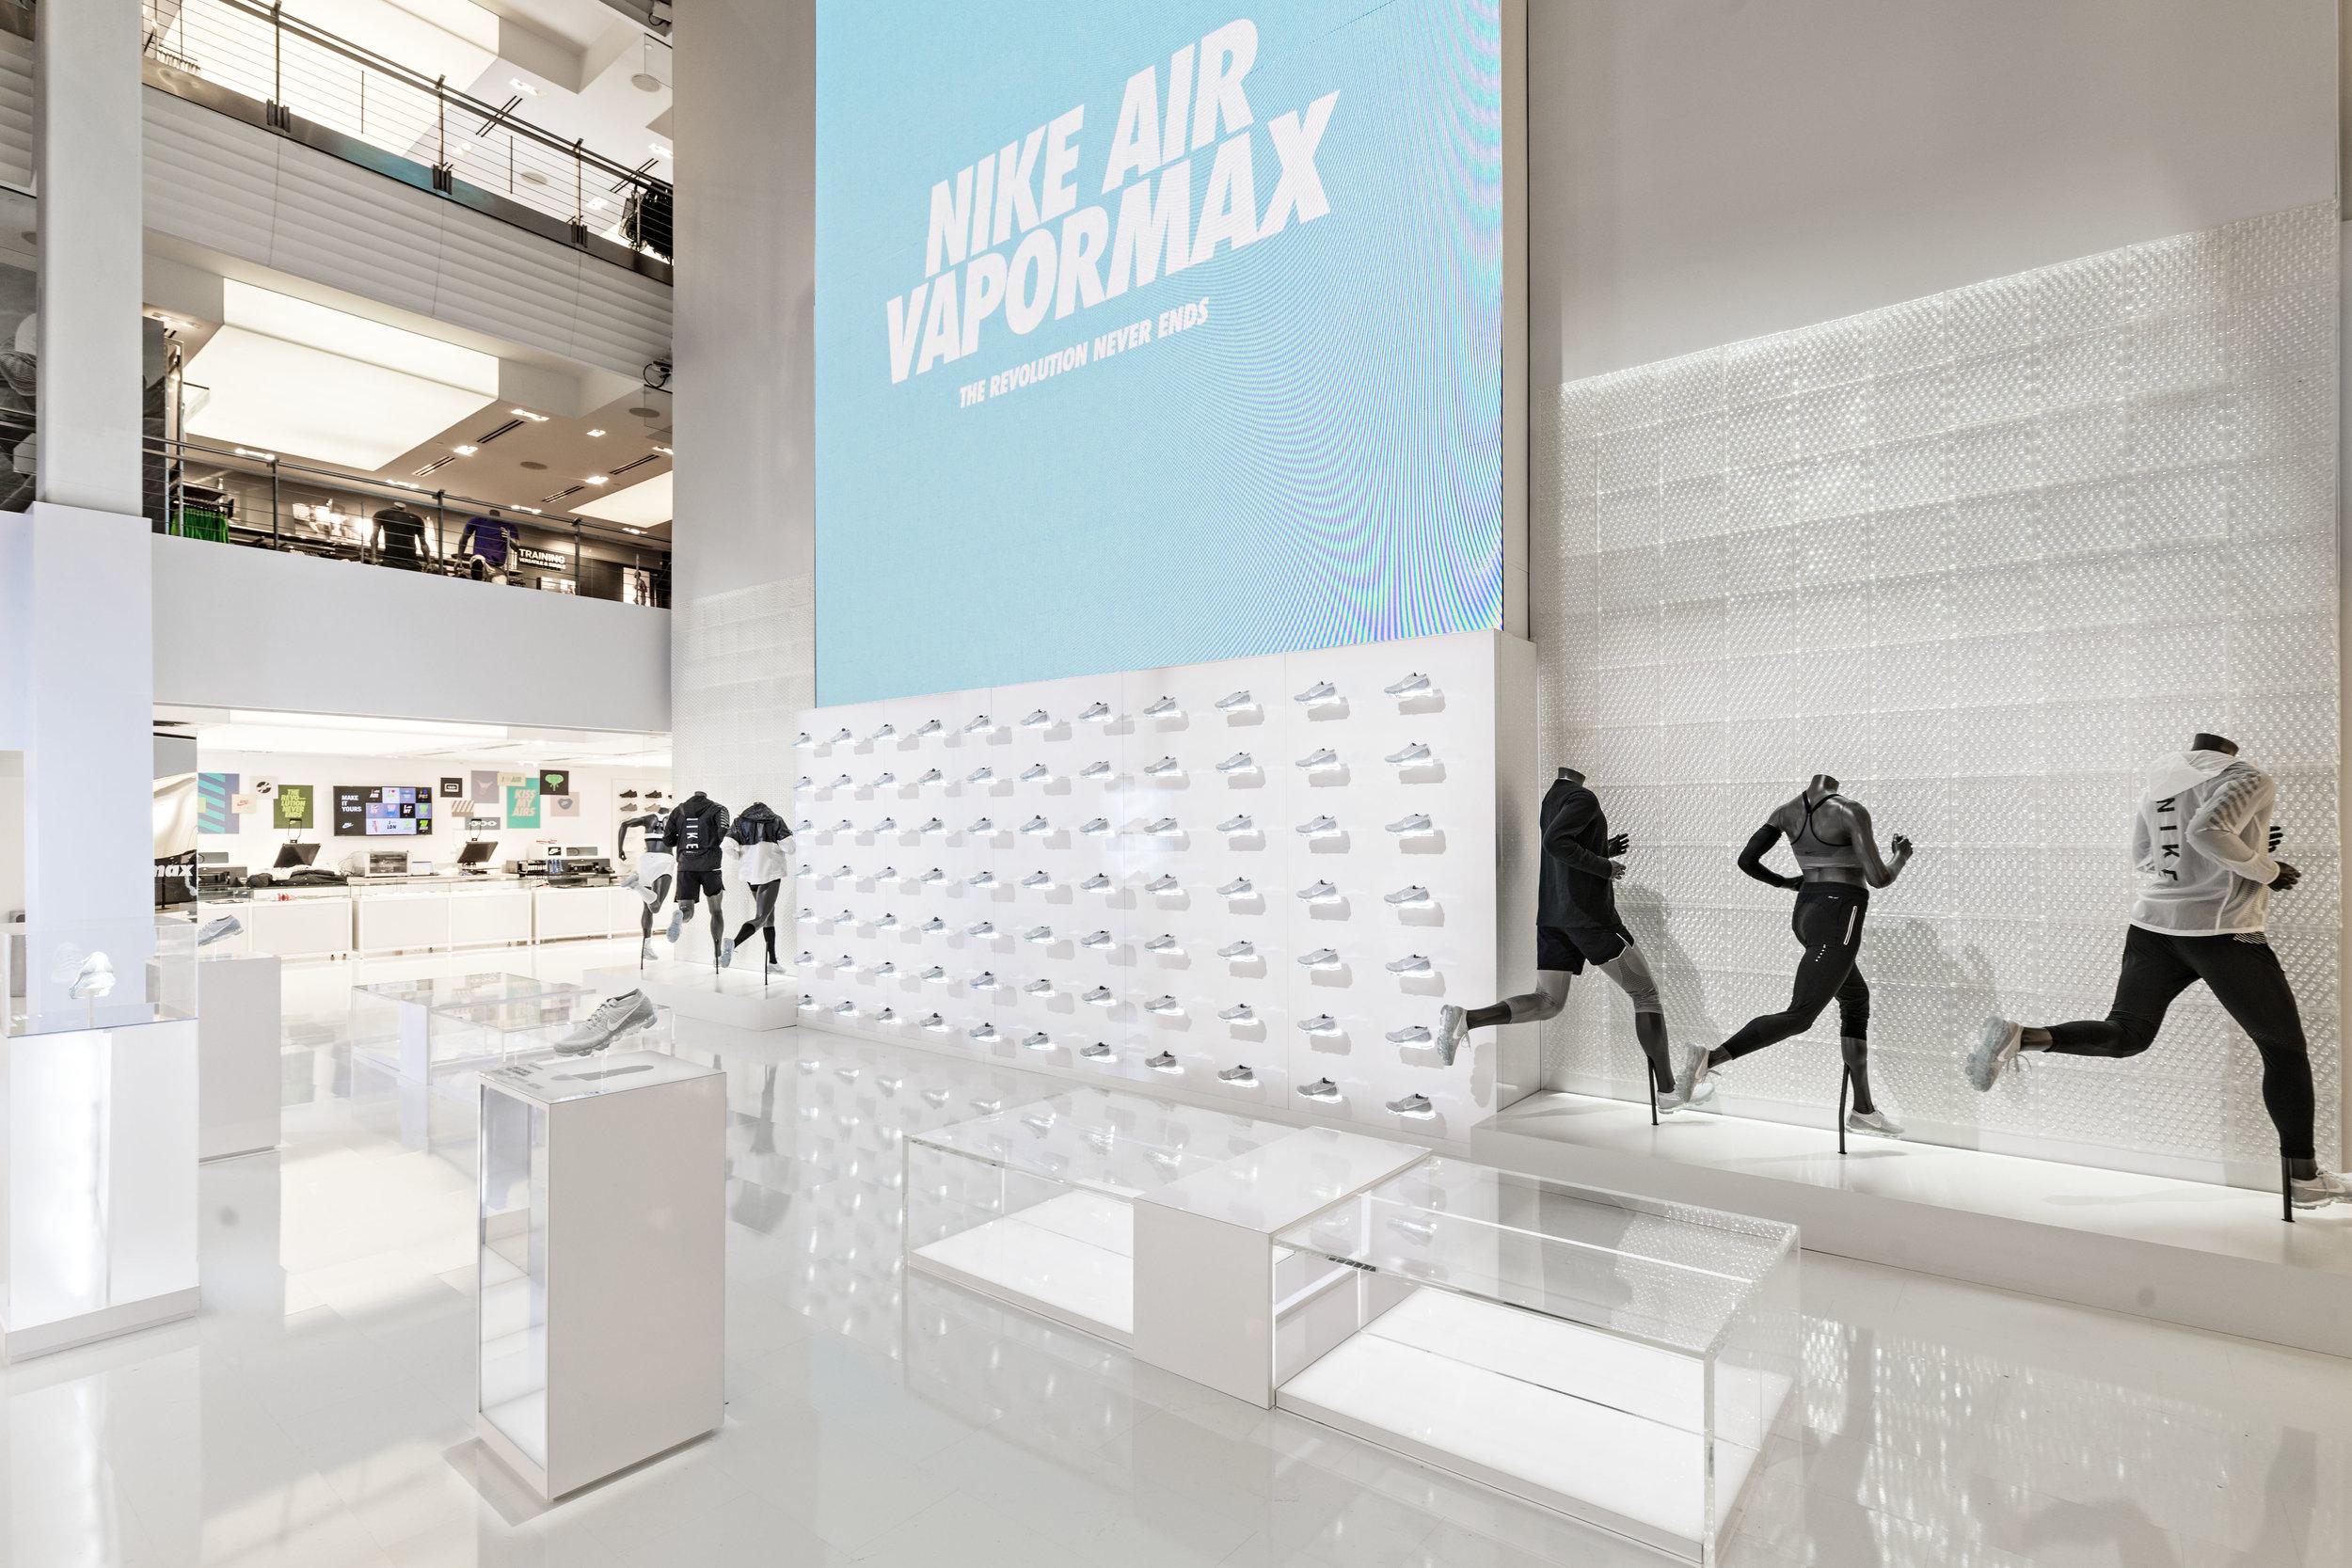 2017-03-26_Niketown_Vapormax_0090-HDR.jpg